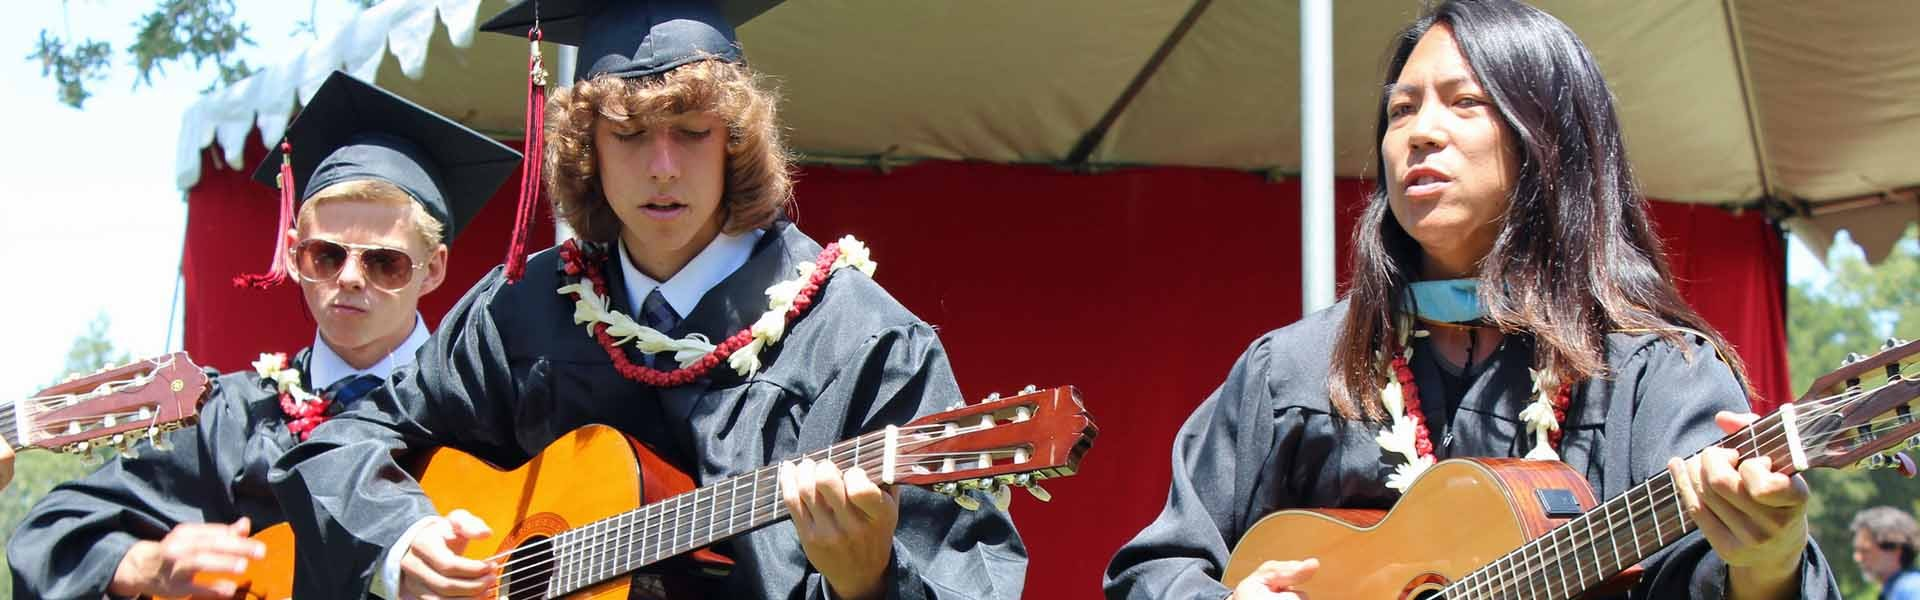 DunnSchool-Highschool-California-Band-Main-Banner-2019